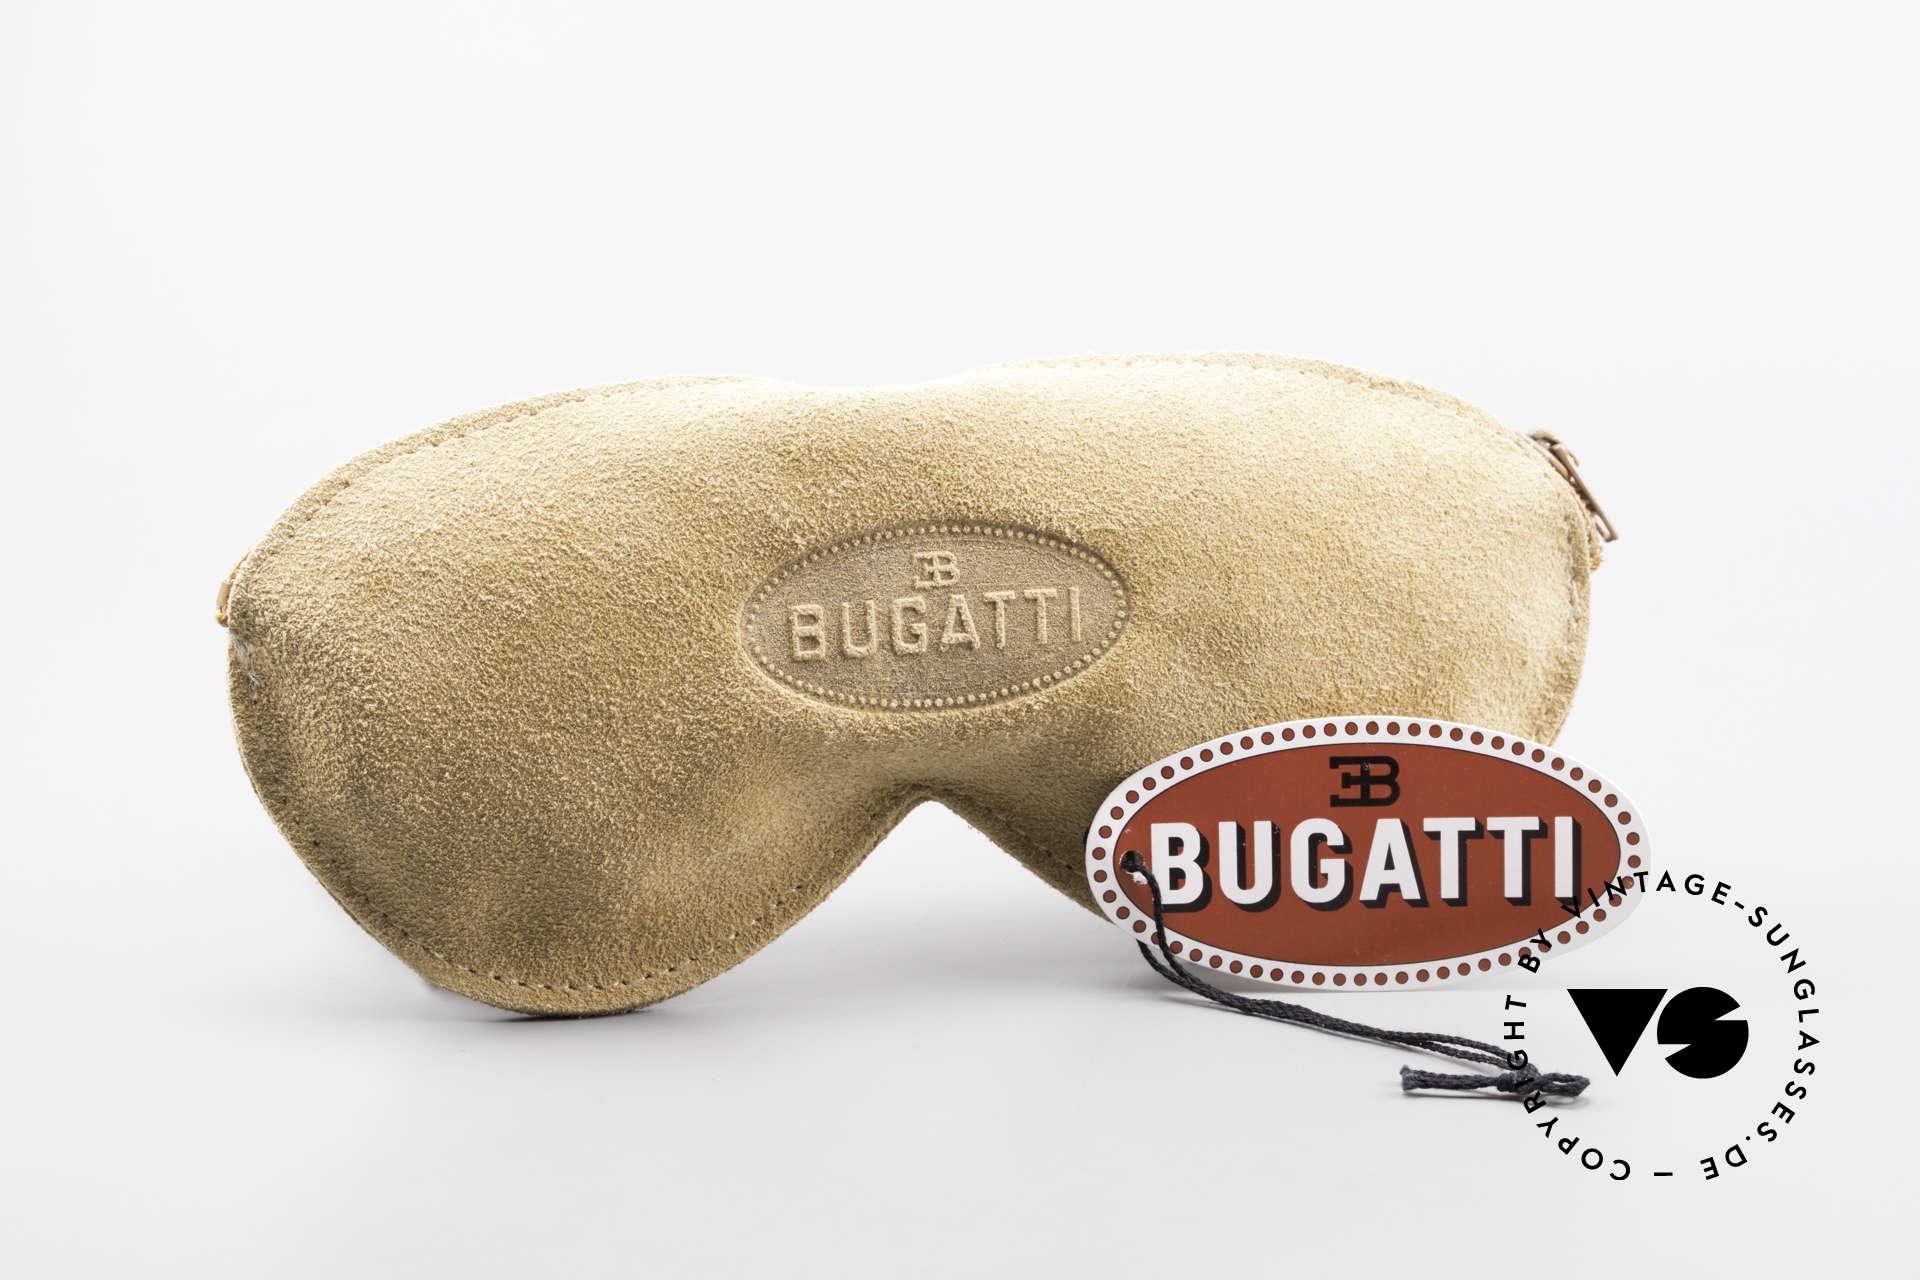 Bugatti 14782 Luxury 80's Eyeglass-Frame, Size: large, Made for Men